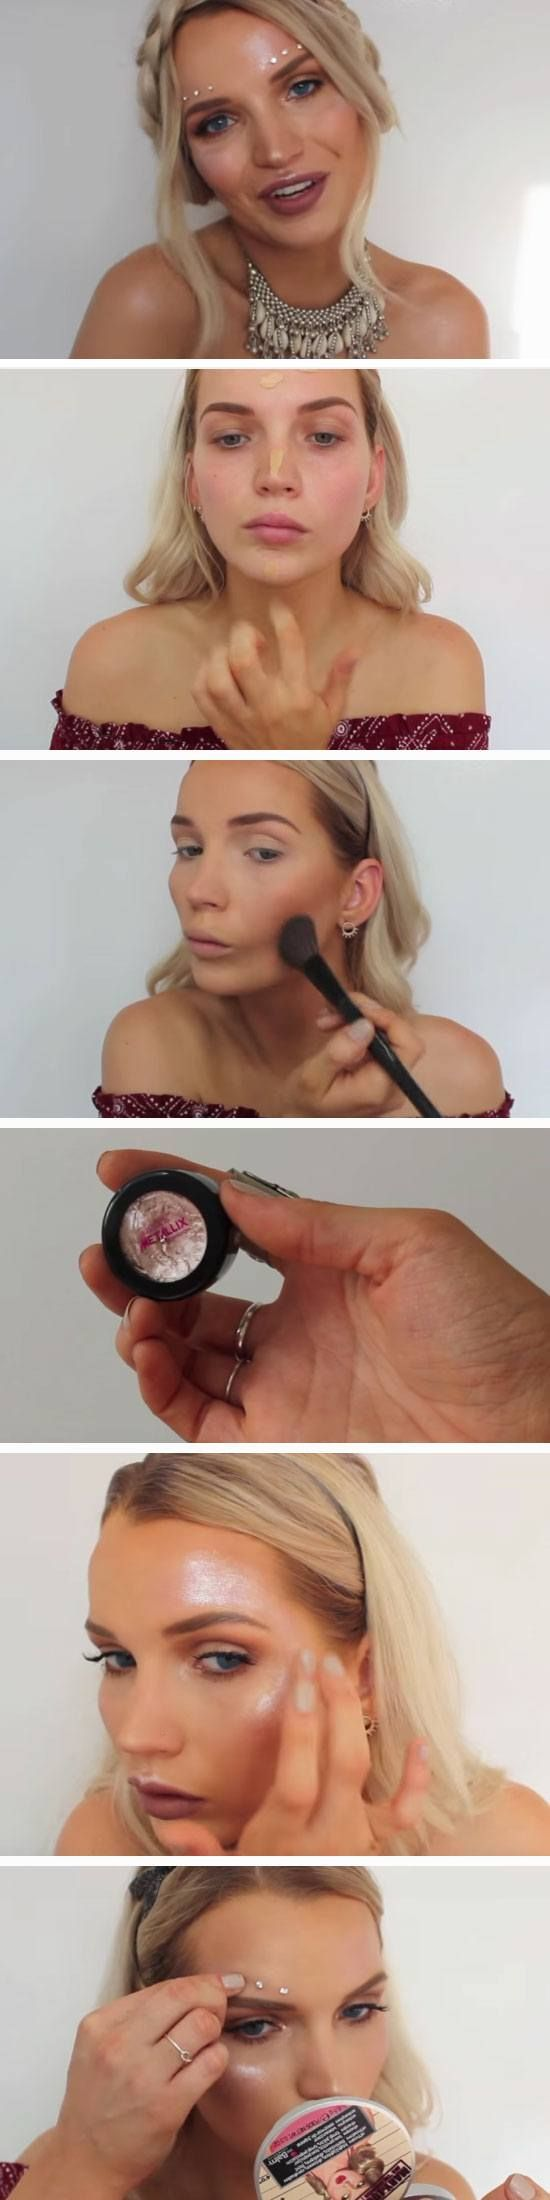 Diamante | 17 Summer Festival Makeup Ideas for Teens and the Coachella bound!